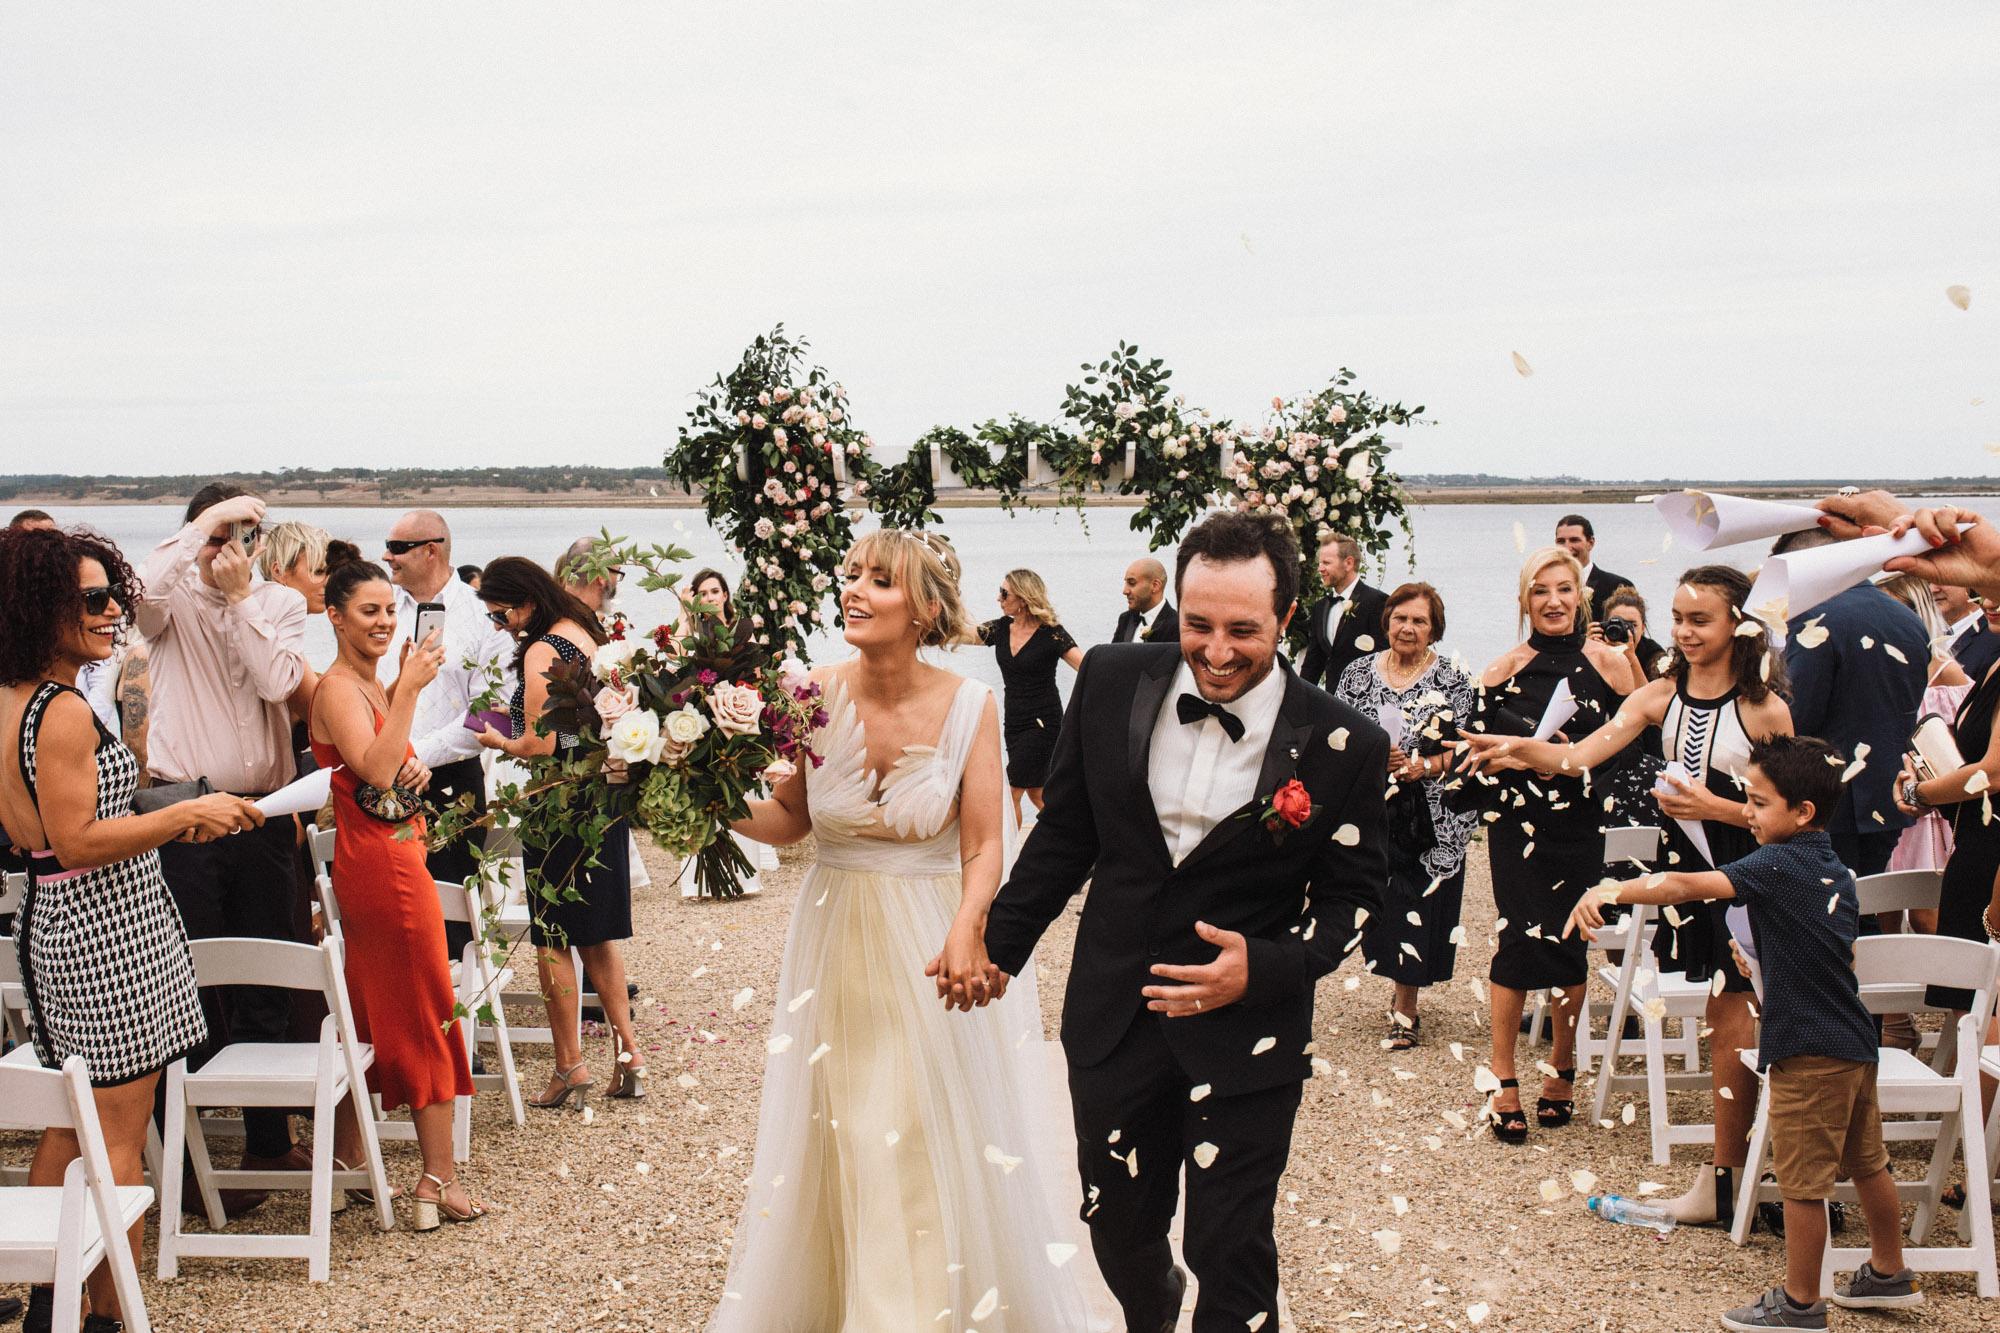 Hannah & Jason 17.03.2018, married at Campbell Point House, Bellarine Peninsula